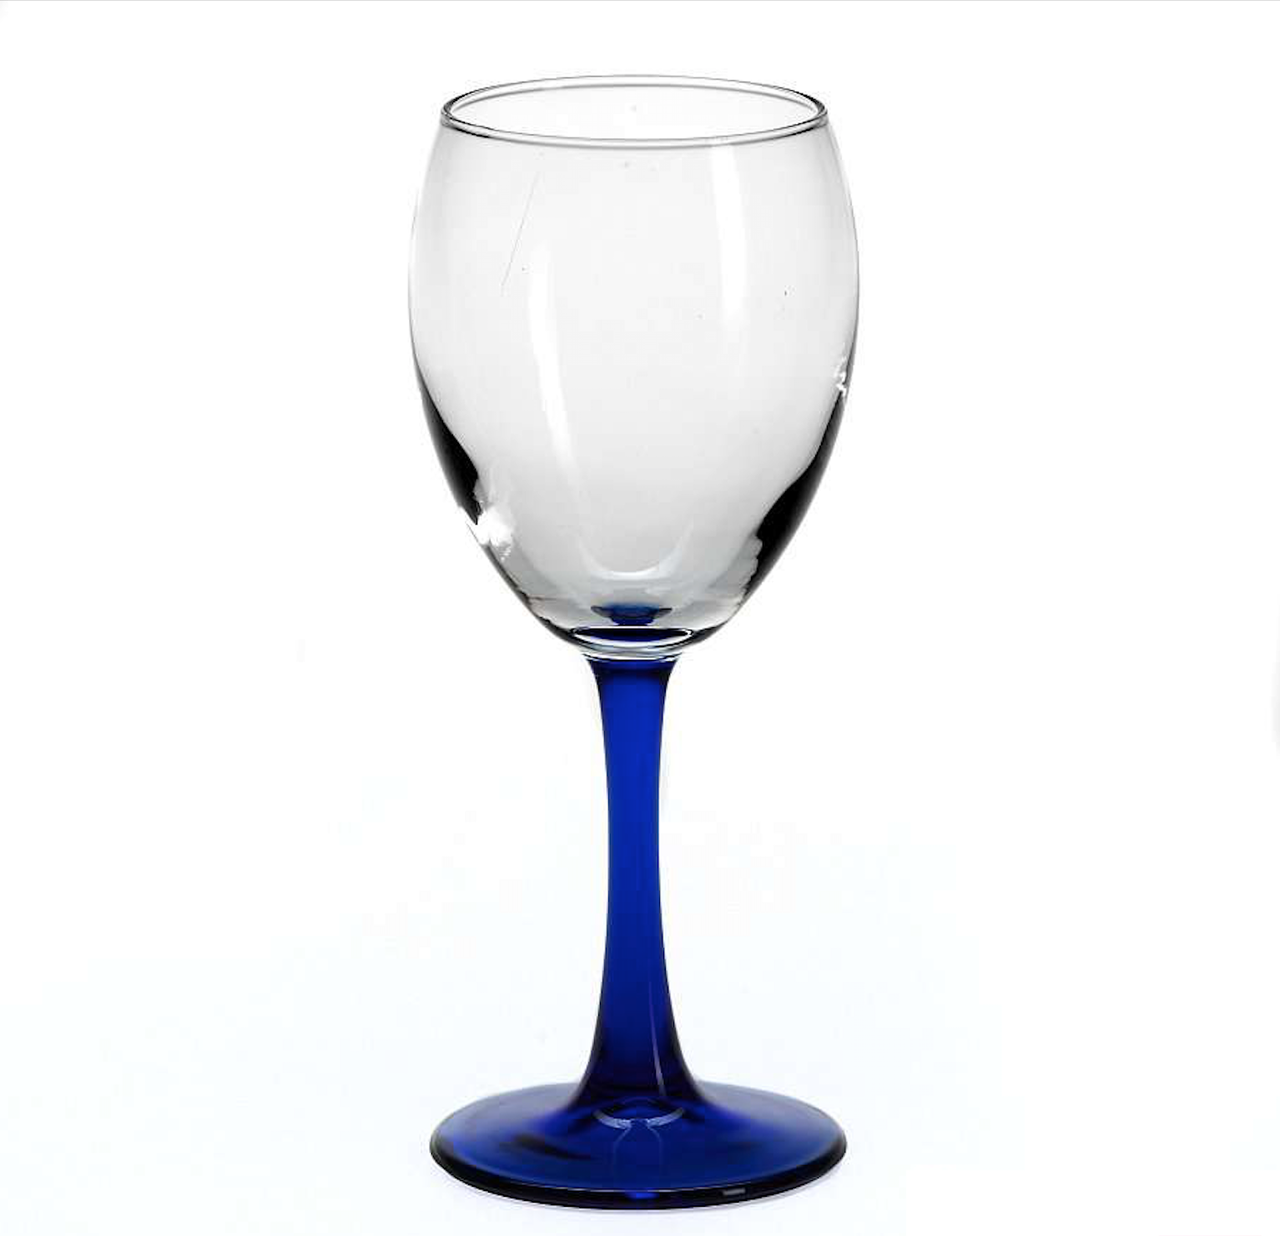 Набор бокалов для вина Imperial Blue Pasabahce, 240 мл (4 шт)